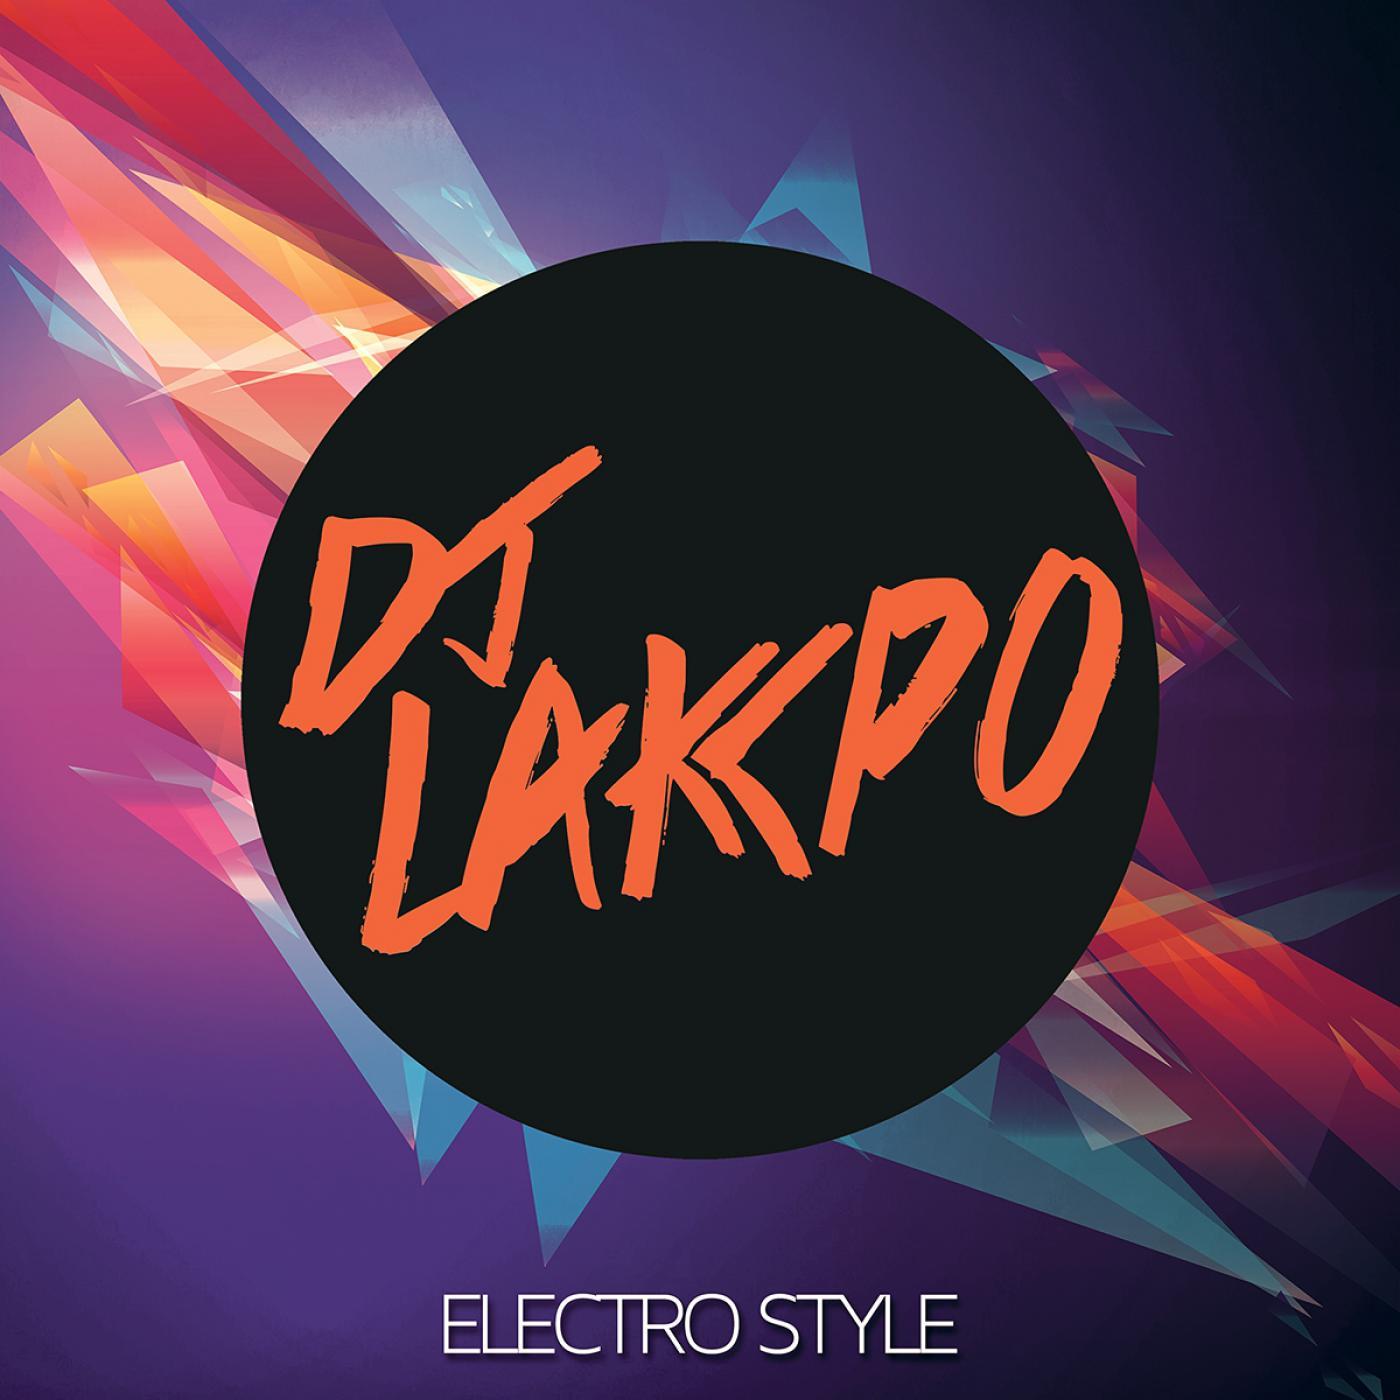 Electro Style